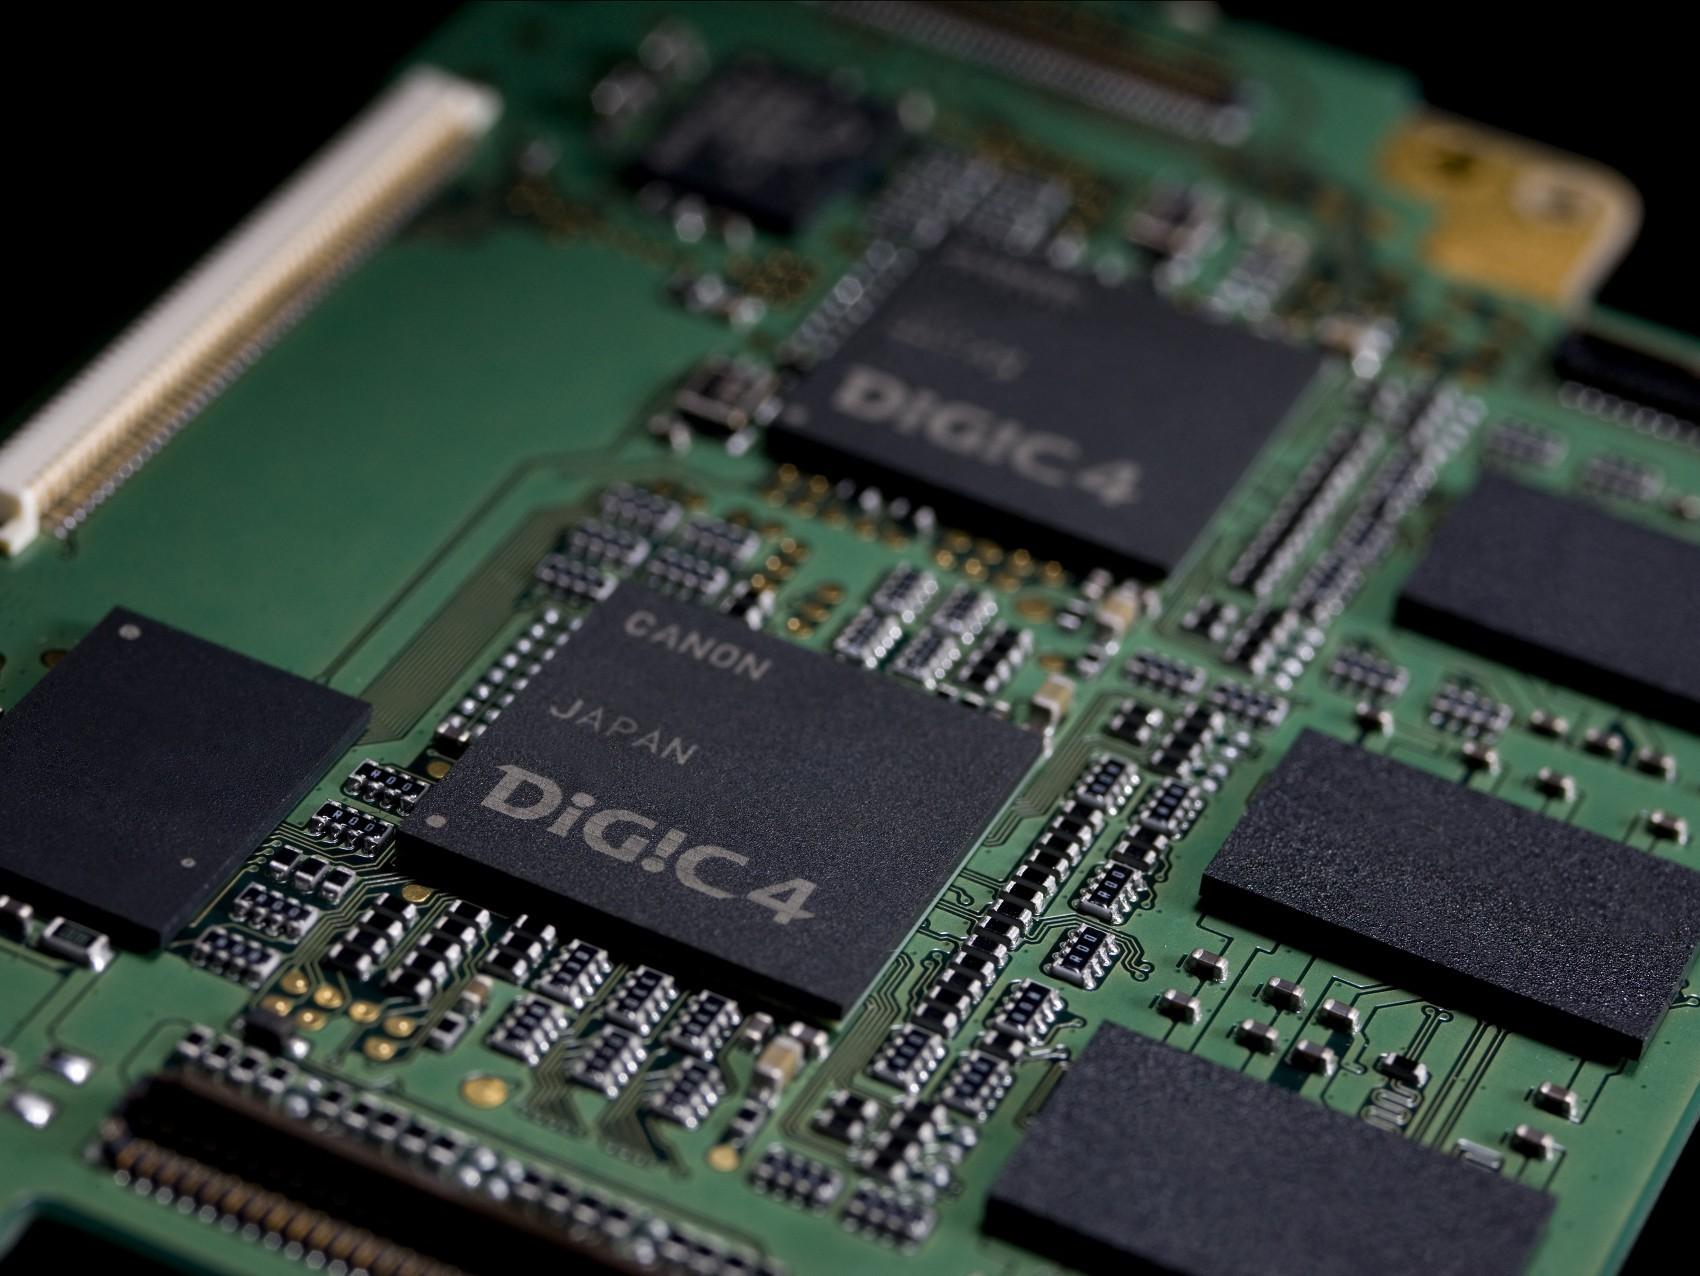 Canon EOS 7D - Firmware 1.2.1 beseitigt Probleme - Canon EOS 7D - Digic-4-Prozessor